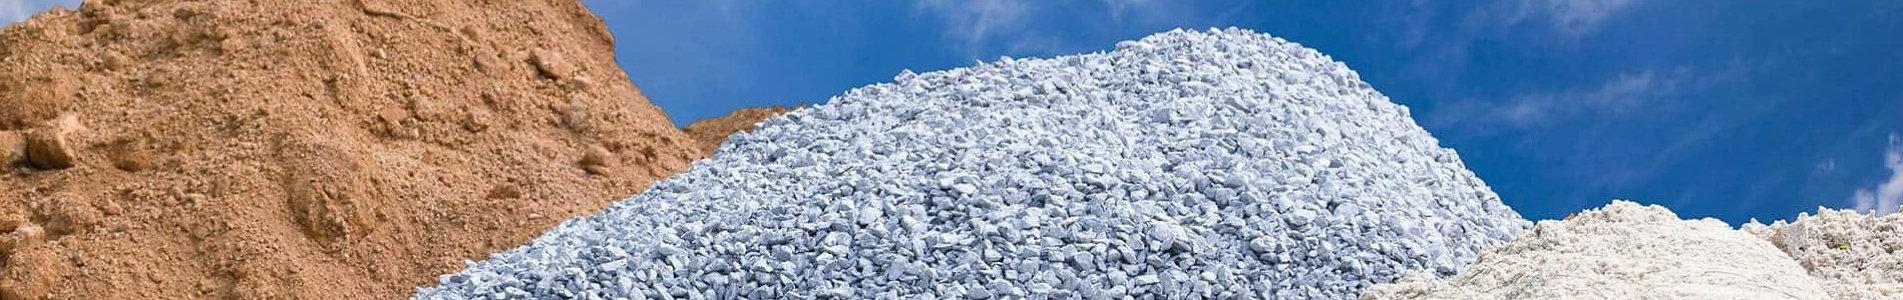 aggregates bagged cement.jpg